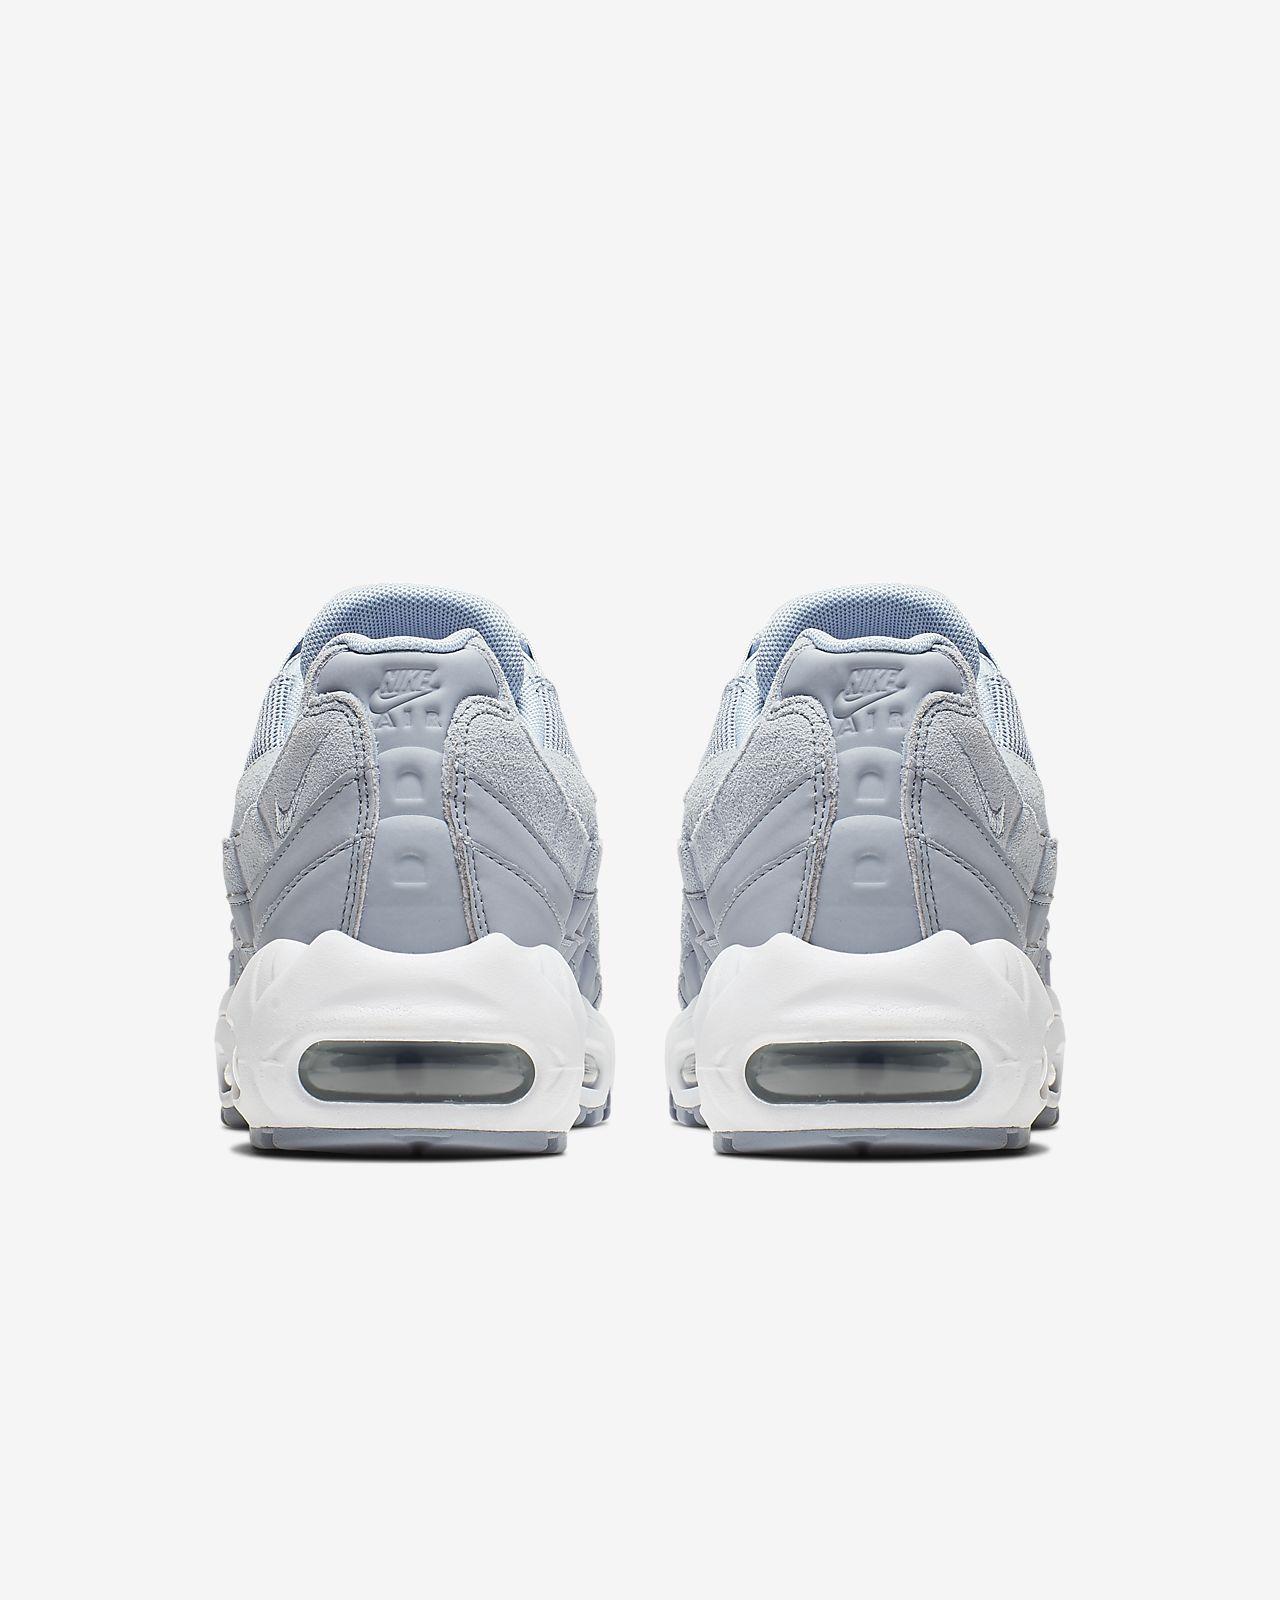 huge discount 7c6aa b5da8 ... Nike Air Max 95 Premium Women s Shoe